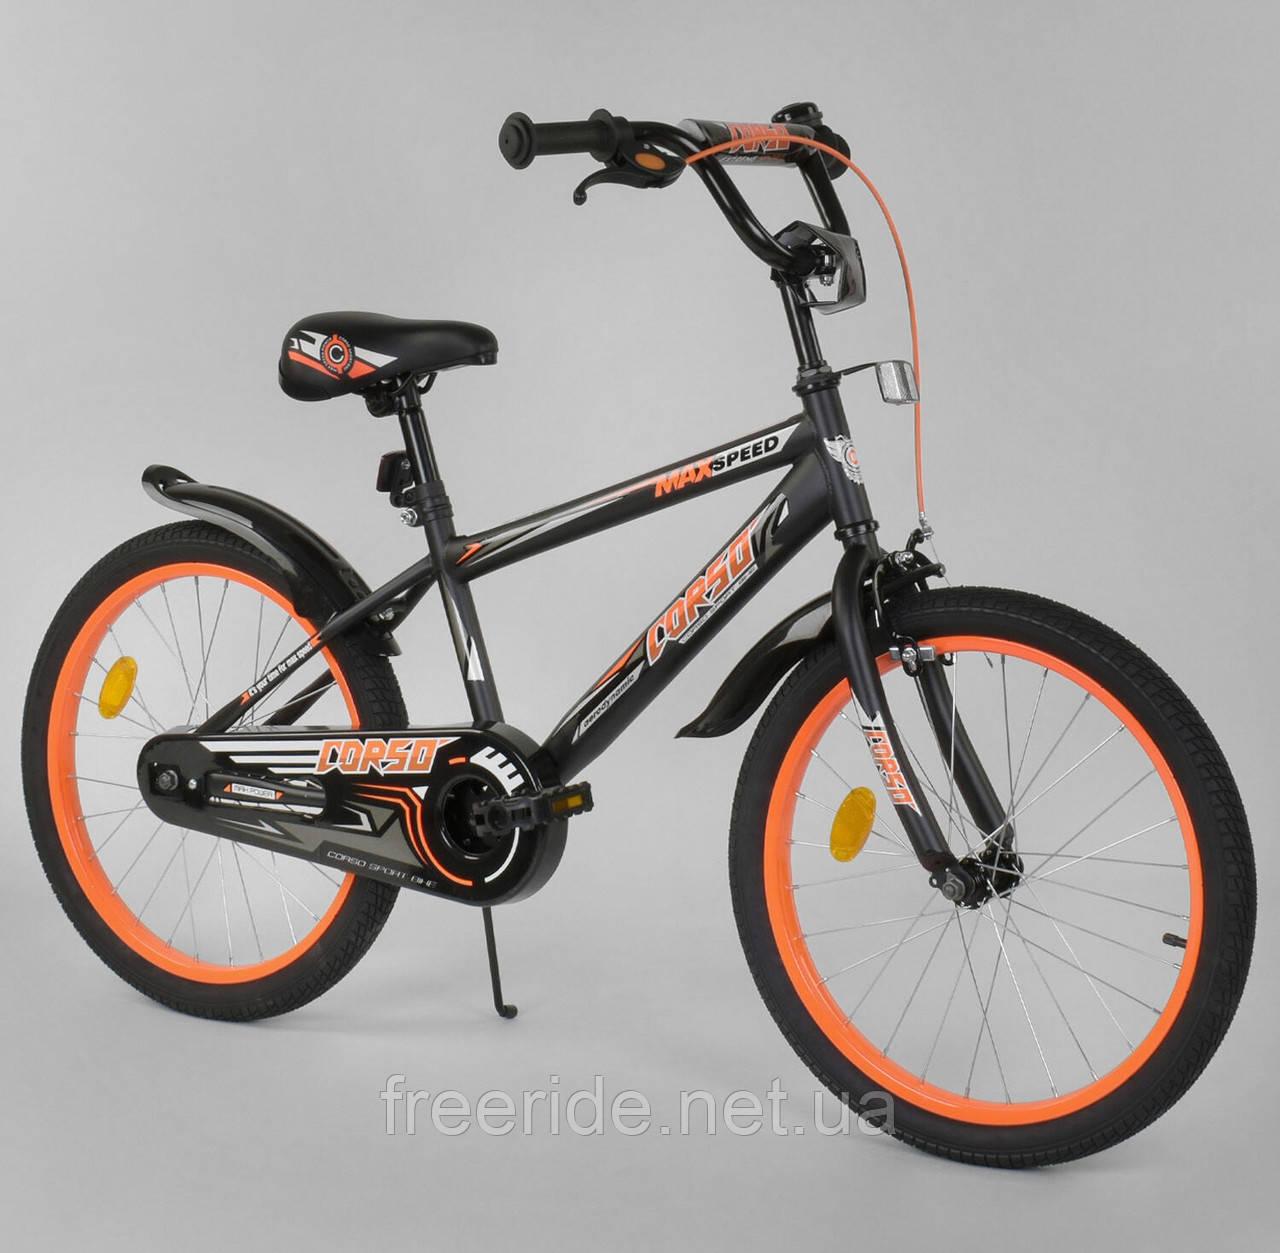 Детский Велосипед CORSO Aerodynamiс EX-20 N